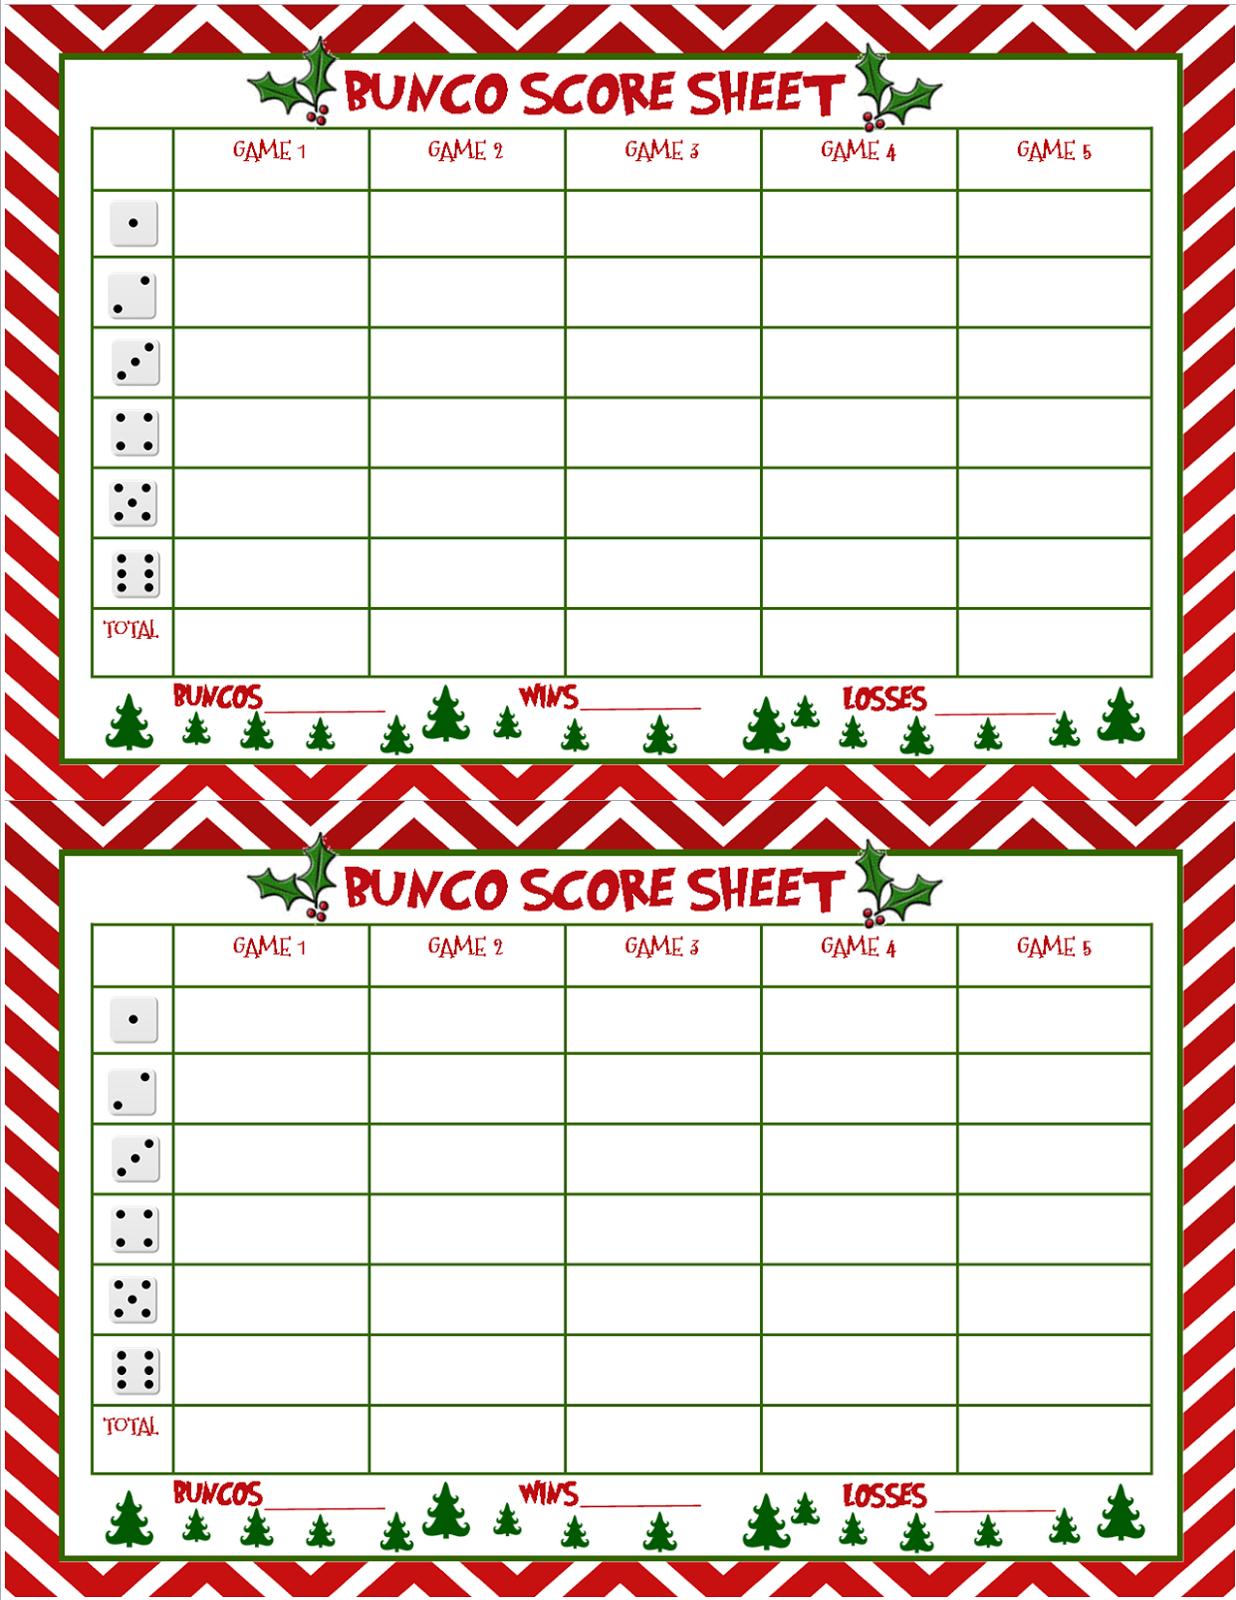 Christmas Bunco Score Sheets Free   Bunco   Bunco Score Sheets - Printable Bunco Score Cards Free